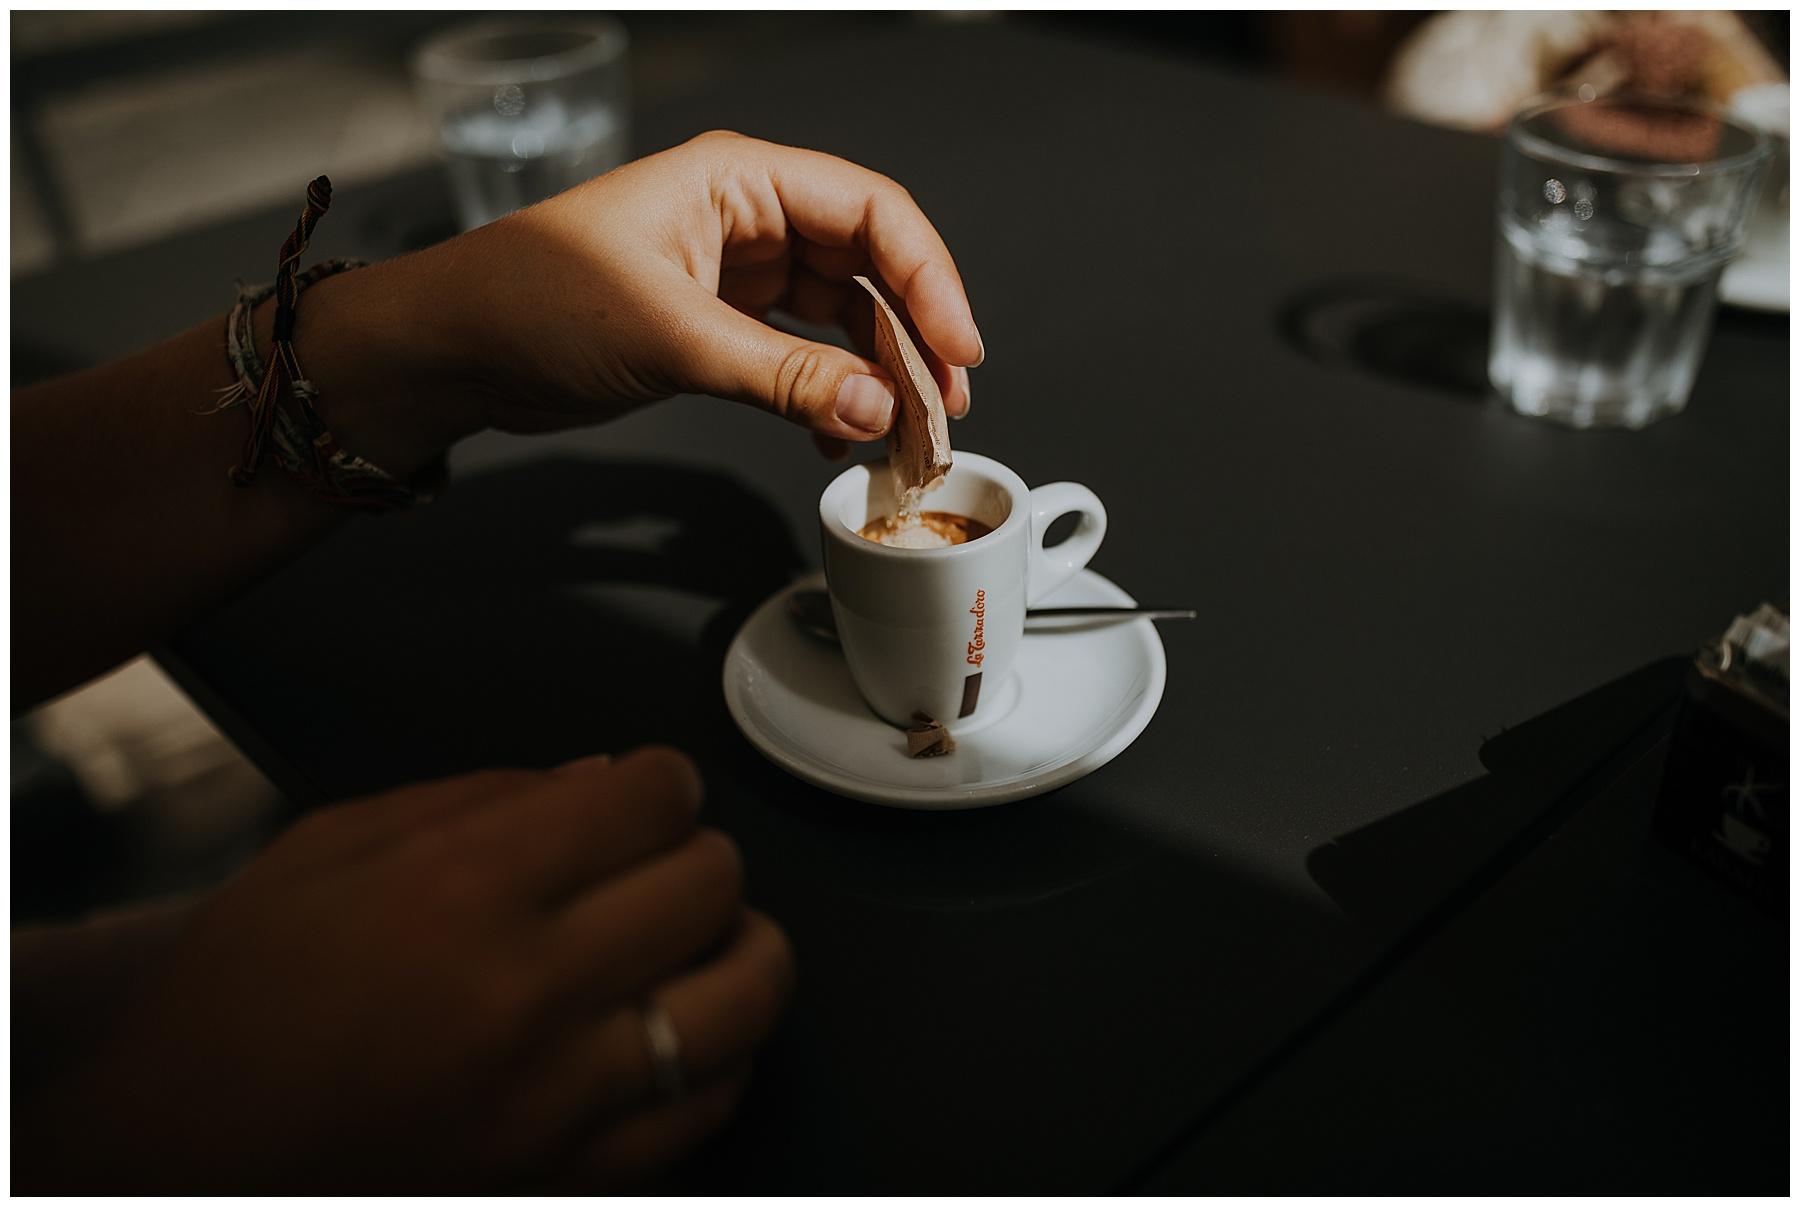 sugar is tipped into espresso